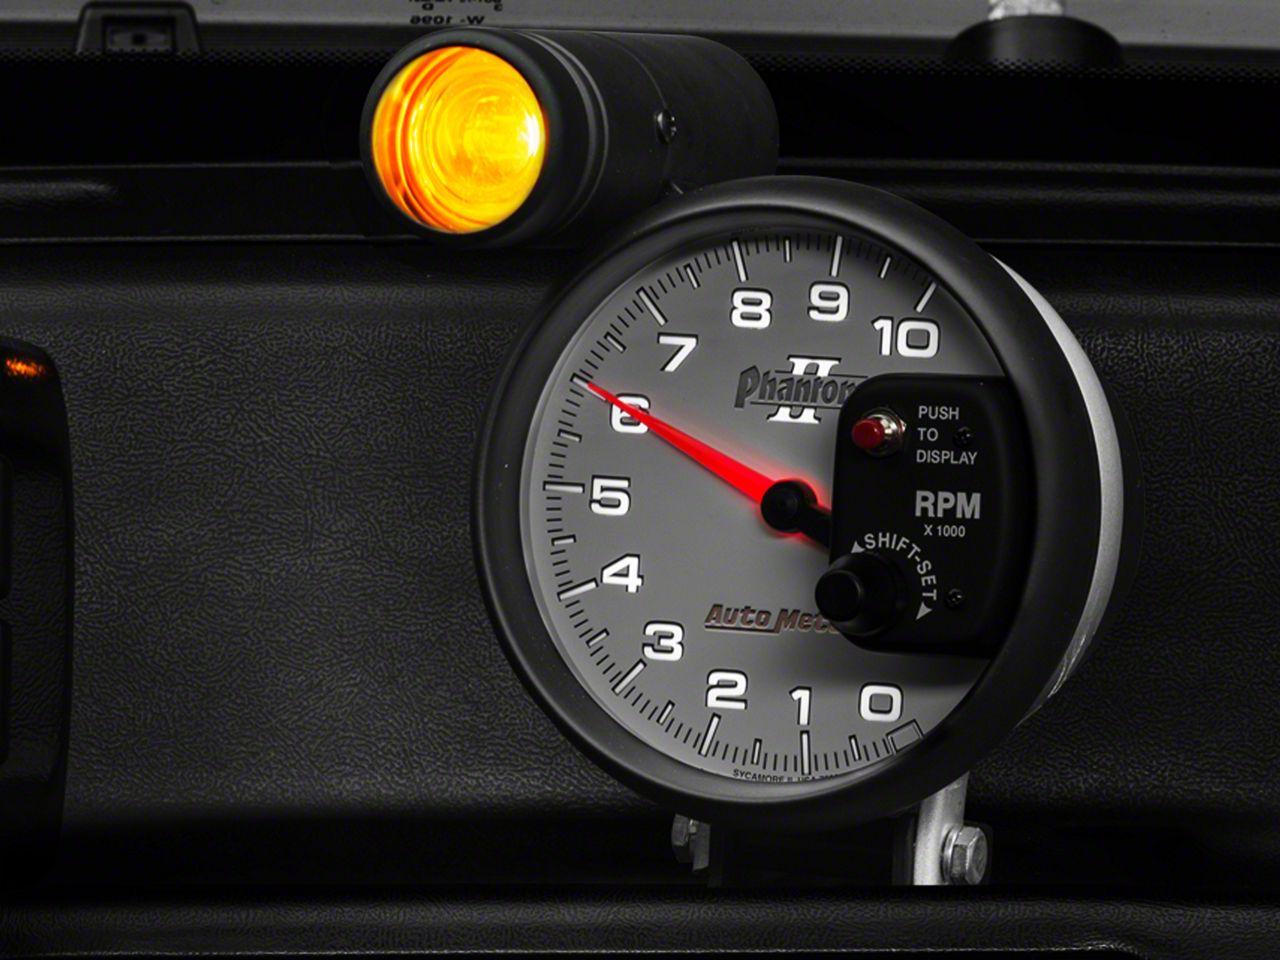 Auto Meter Phantom II 5 in. Tachometer w/ Shift Light (79-19 All)